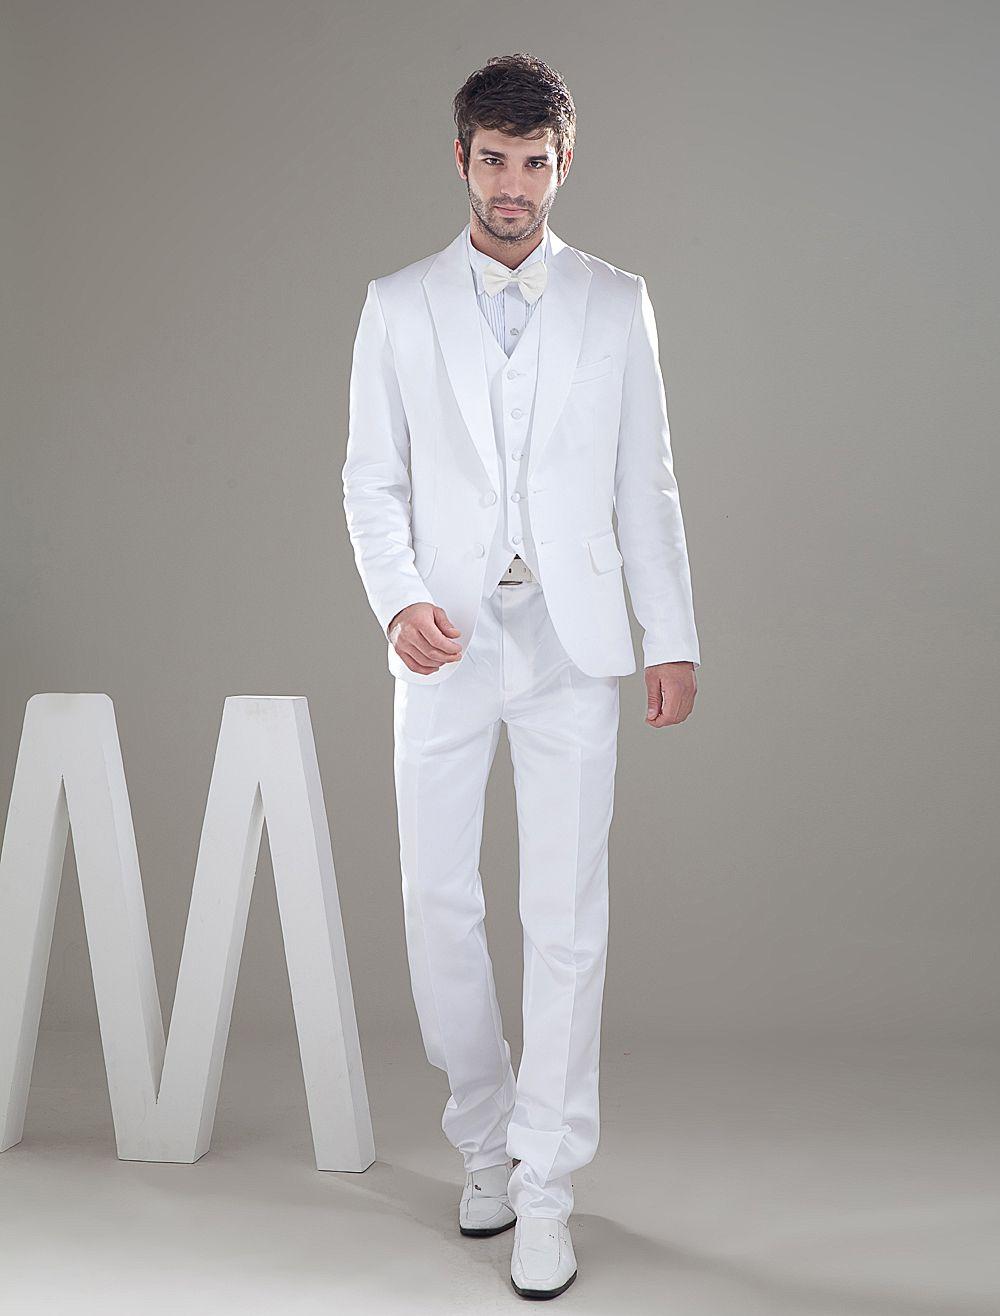 Groom Suits Tuxedo Lime Wedding Dream Tuxedos Fairytale Weddings Inspiration Ideas Stuff